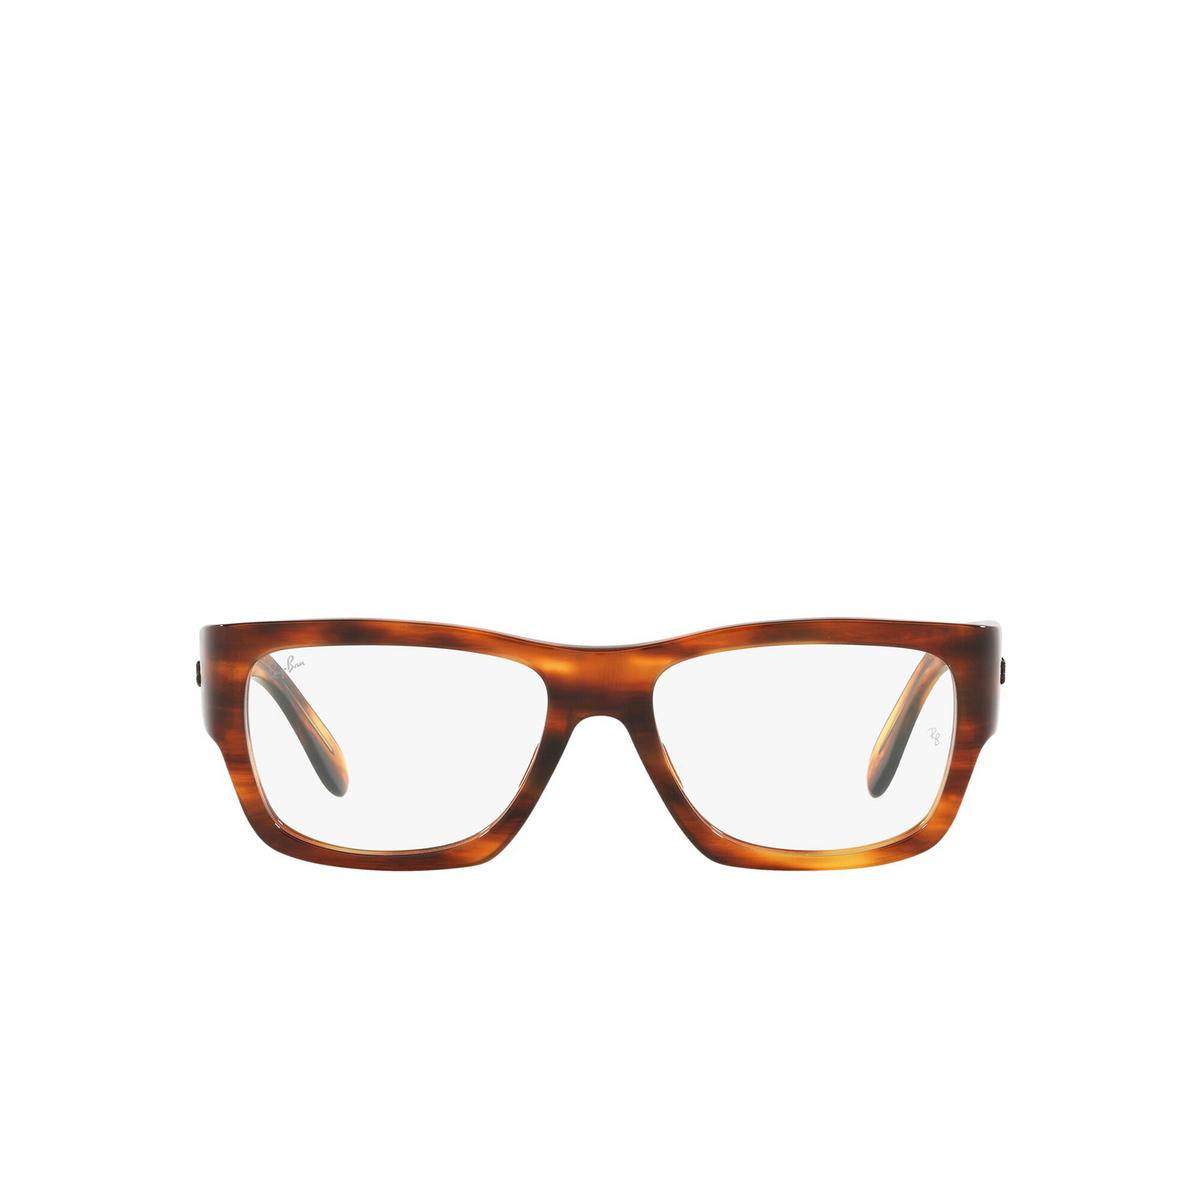 Ray-Ban® Square Eyeglasses: Nomad Wayfarer RX5487 color Striped Havana 2144 - front view.